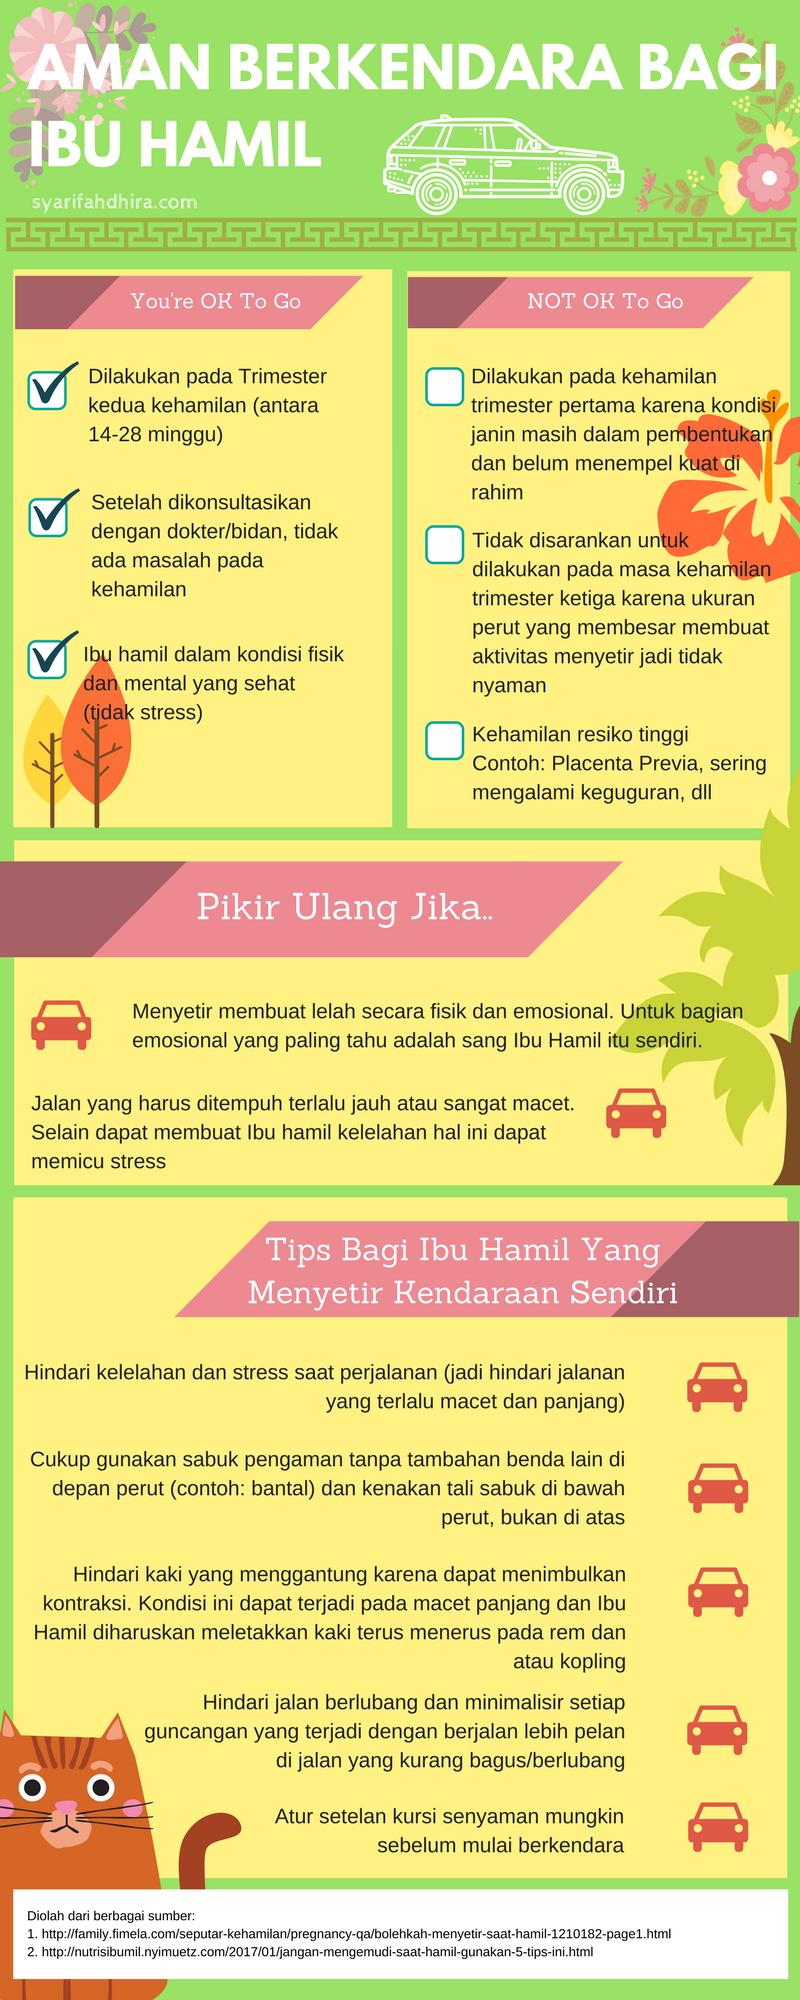 Cara Aman Berkendara Bagi Ibu Hamil (5).png